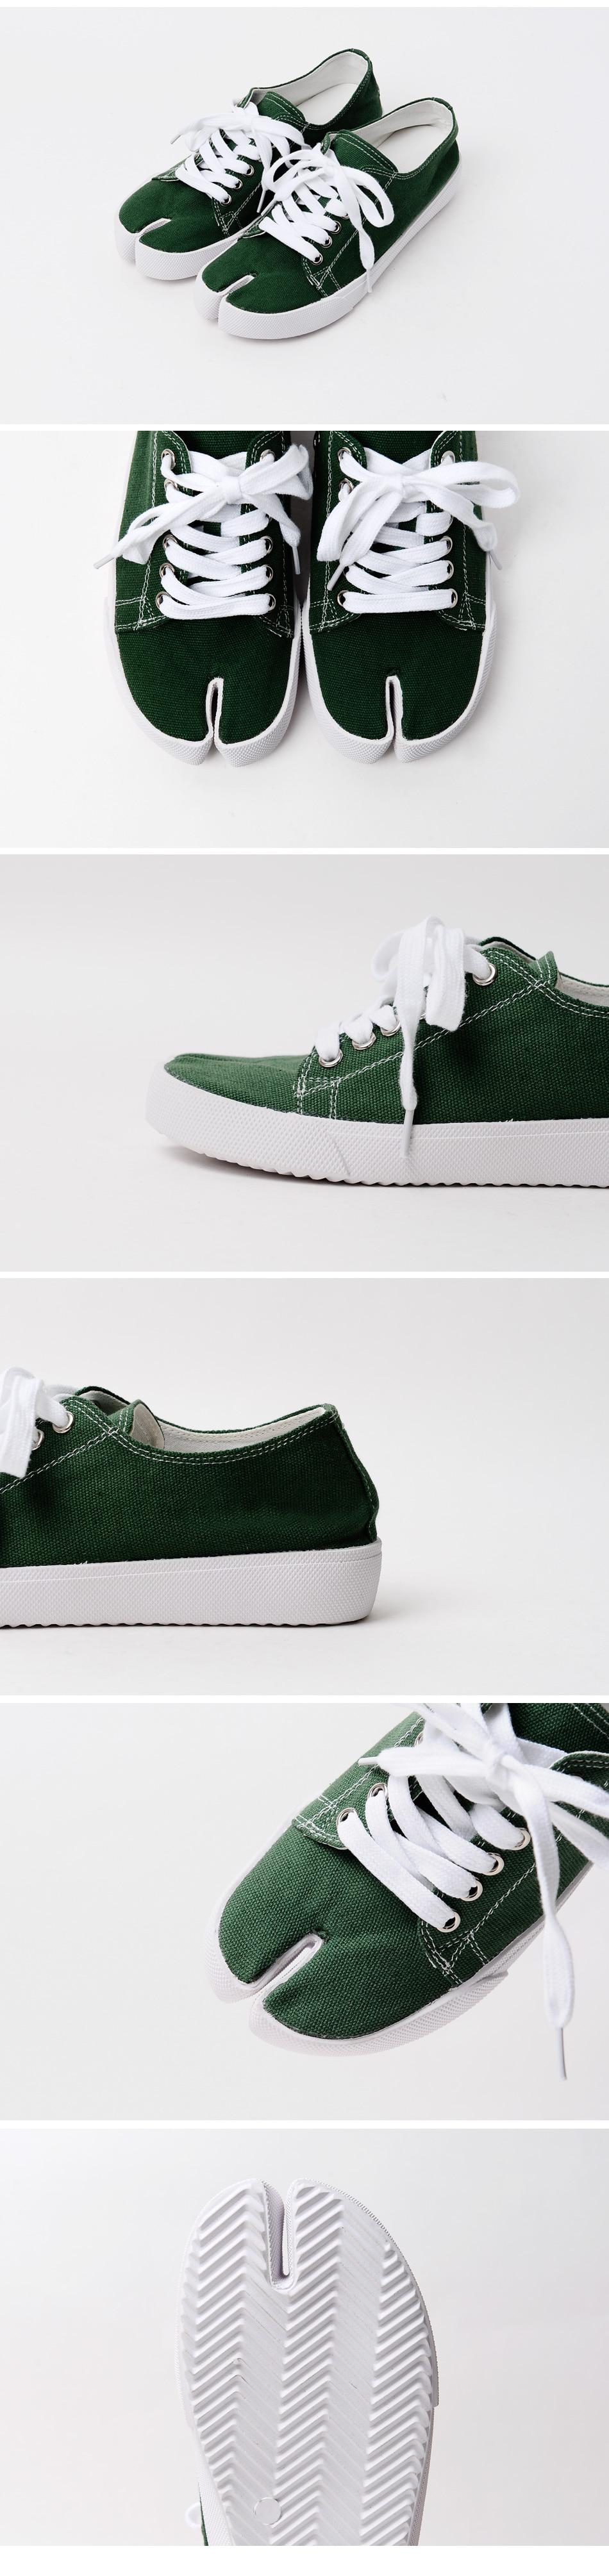 Marel sneakers 3cm